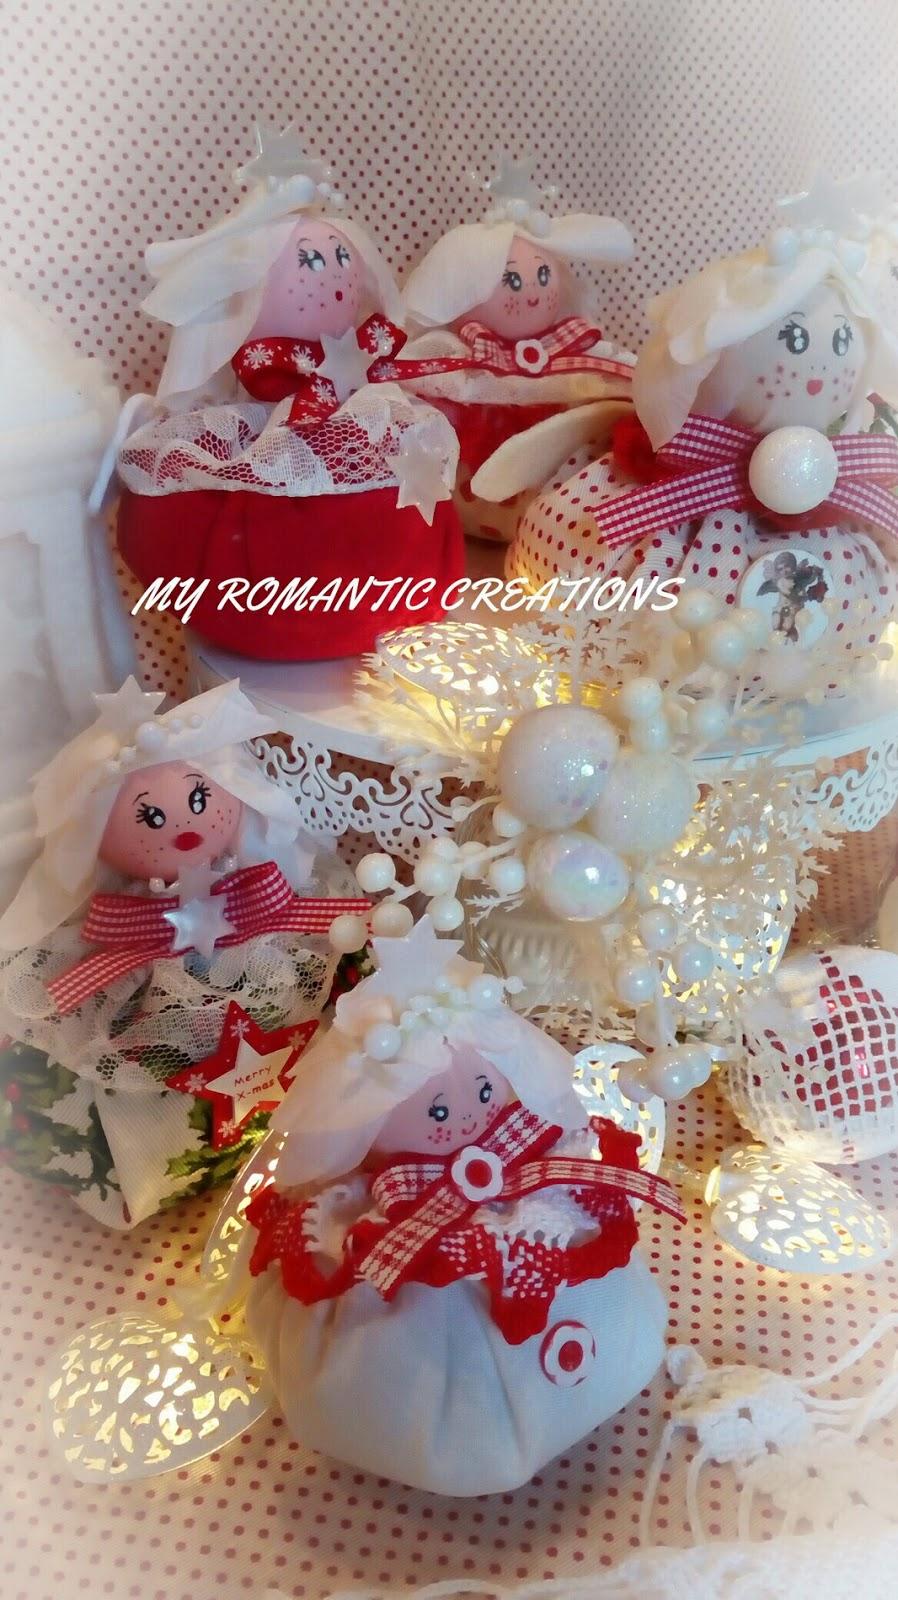 My romantic creations - Nastri decorativi natalizi ...